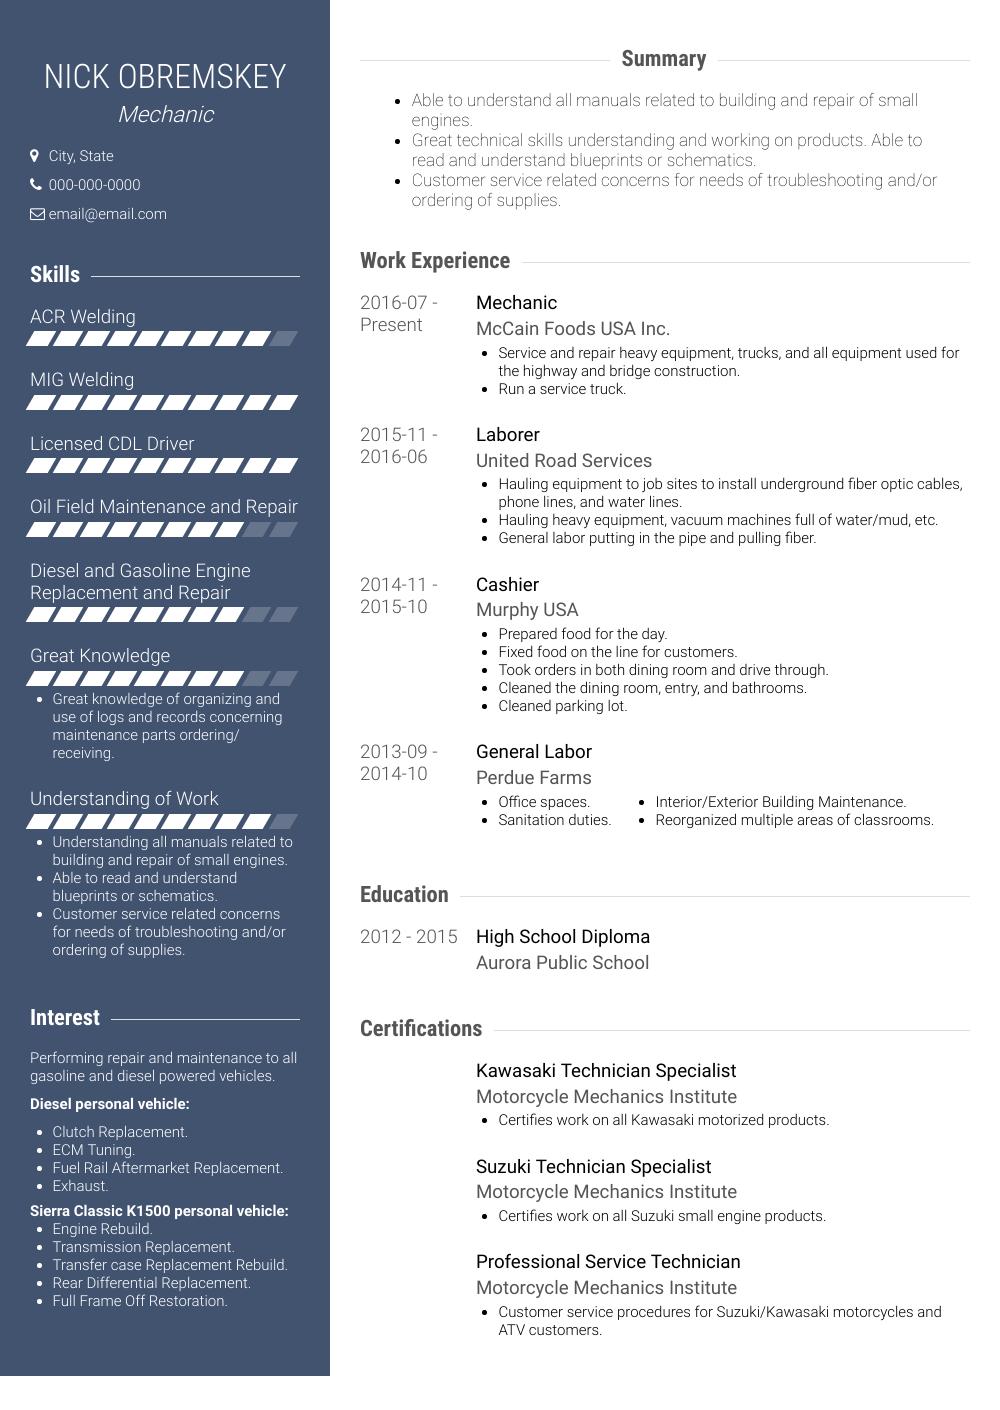 Mechanic Resume Sample and Template